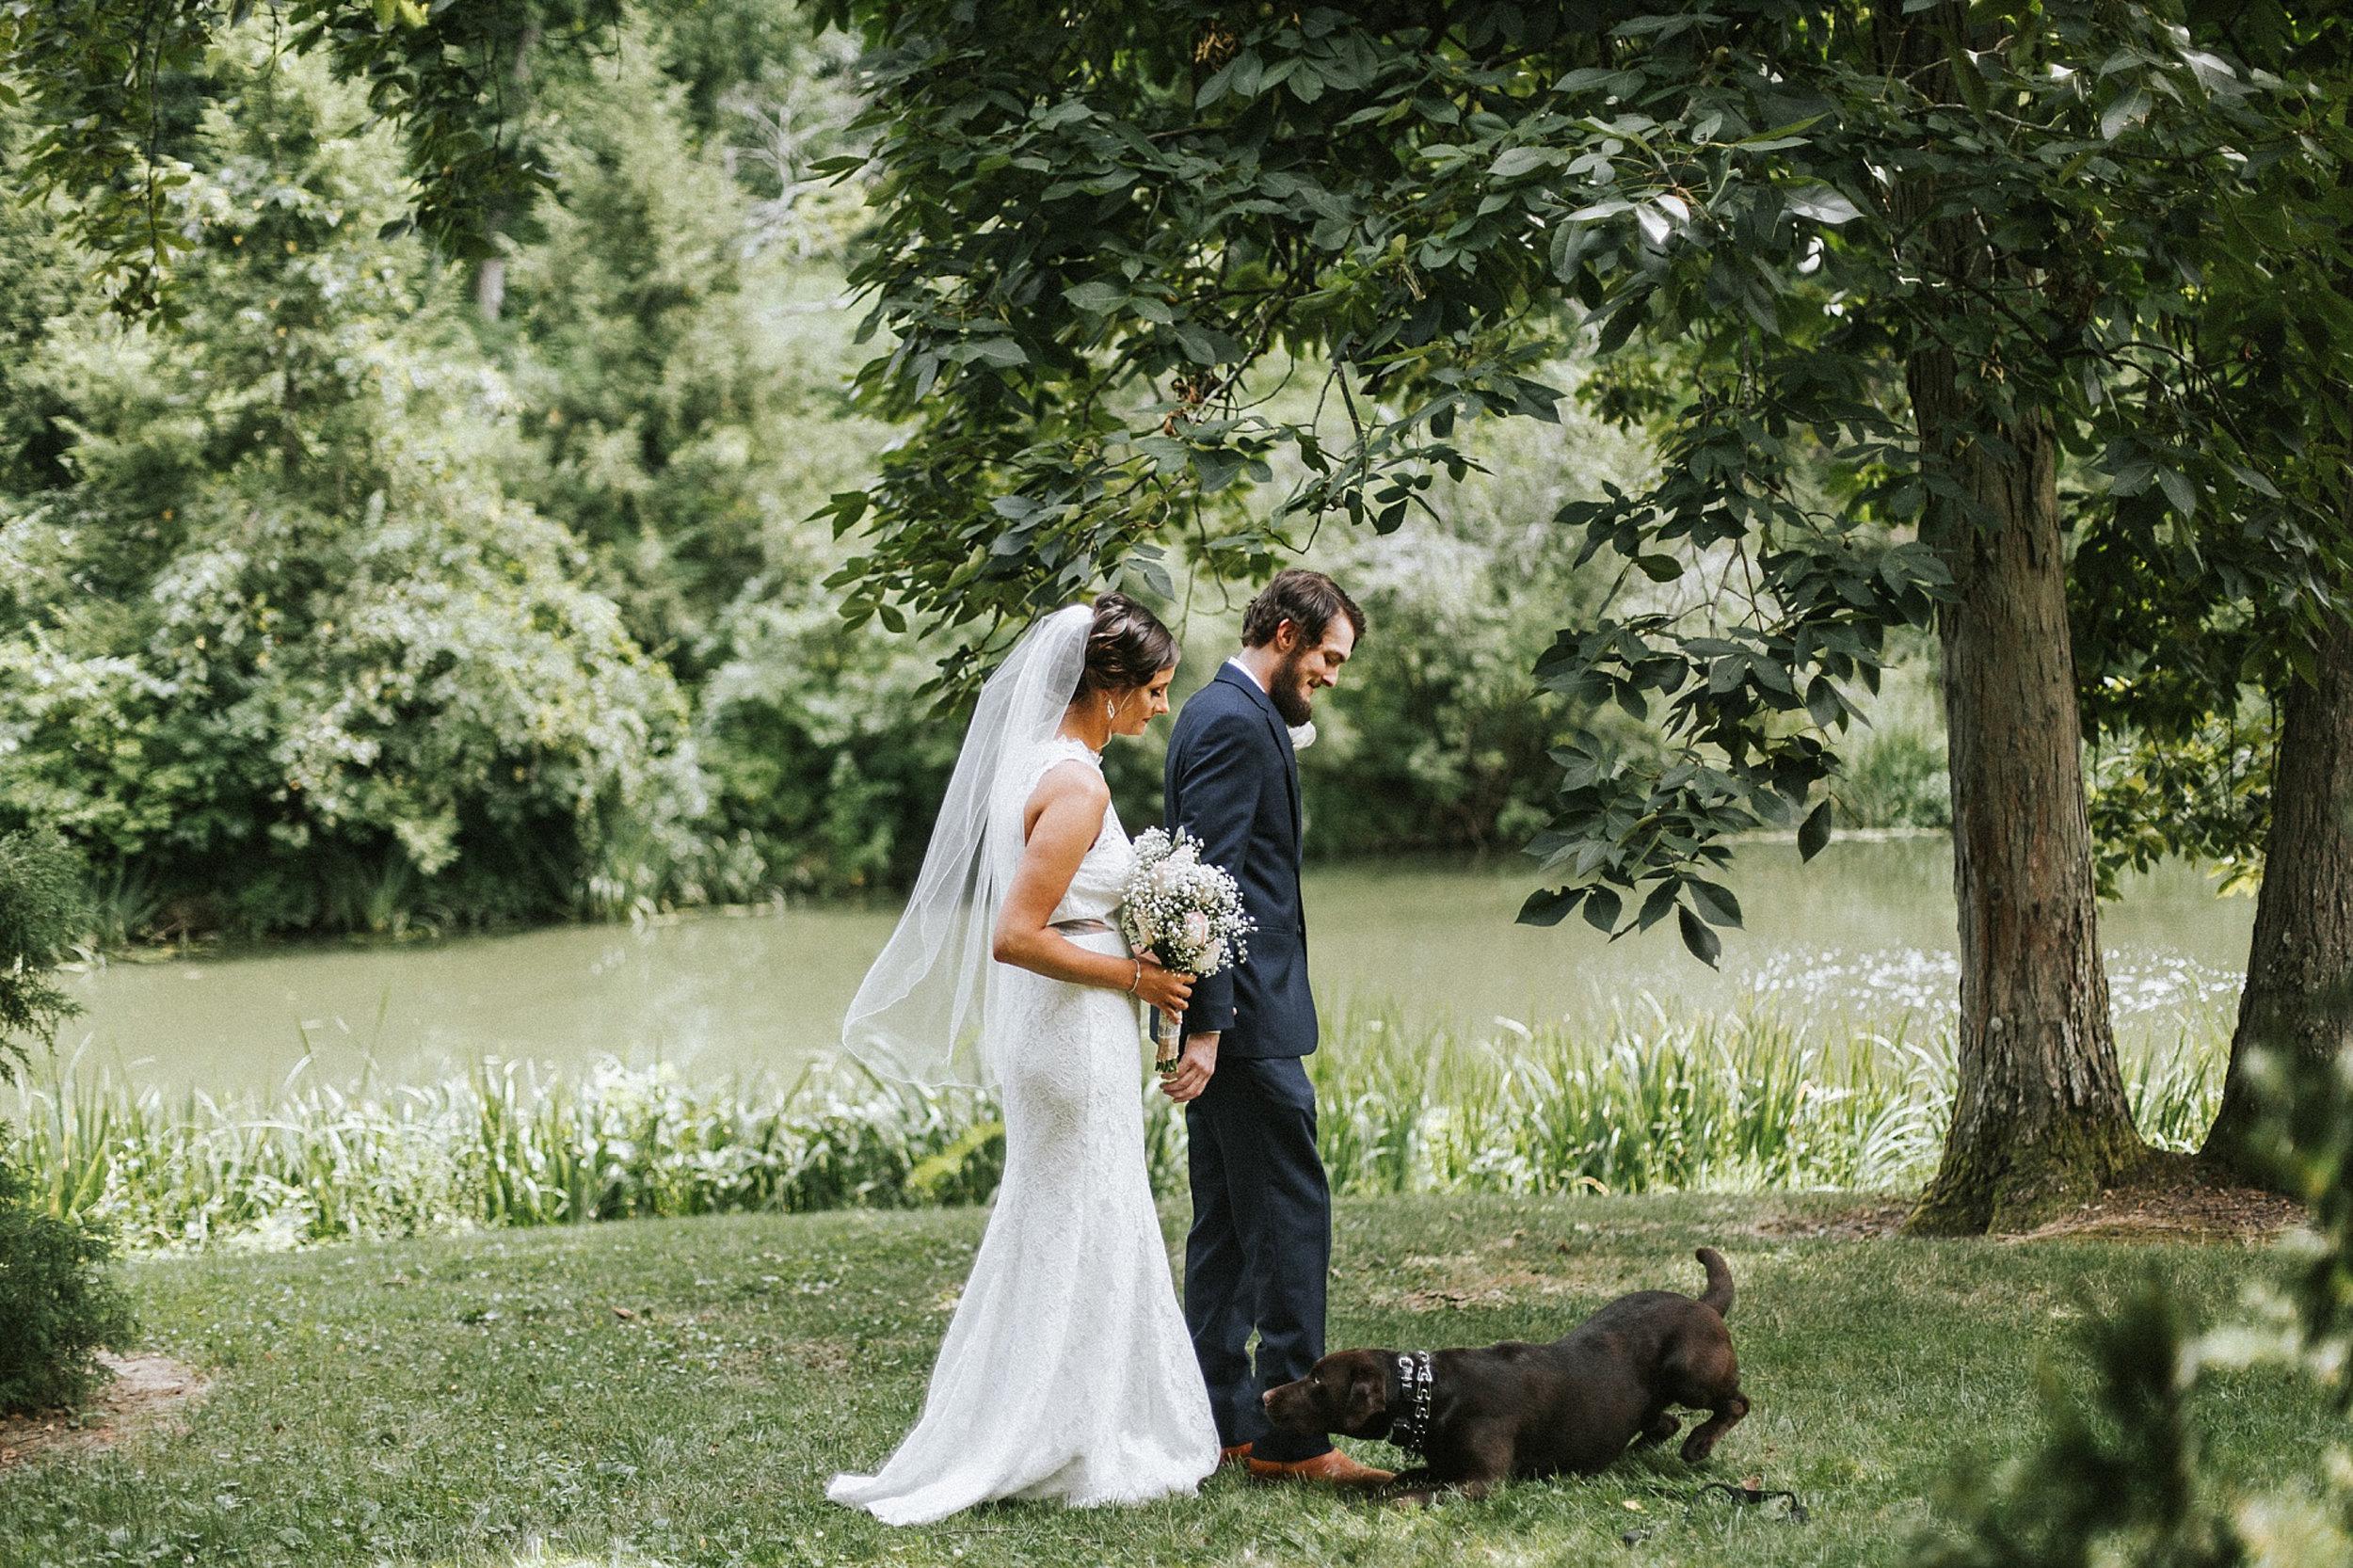 Brooke Townsend Photography - Ohio Wedding Photographer (8 of 78).jpg